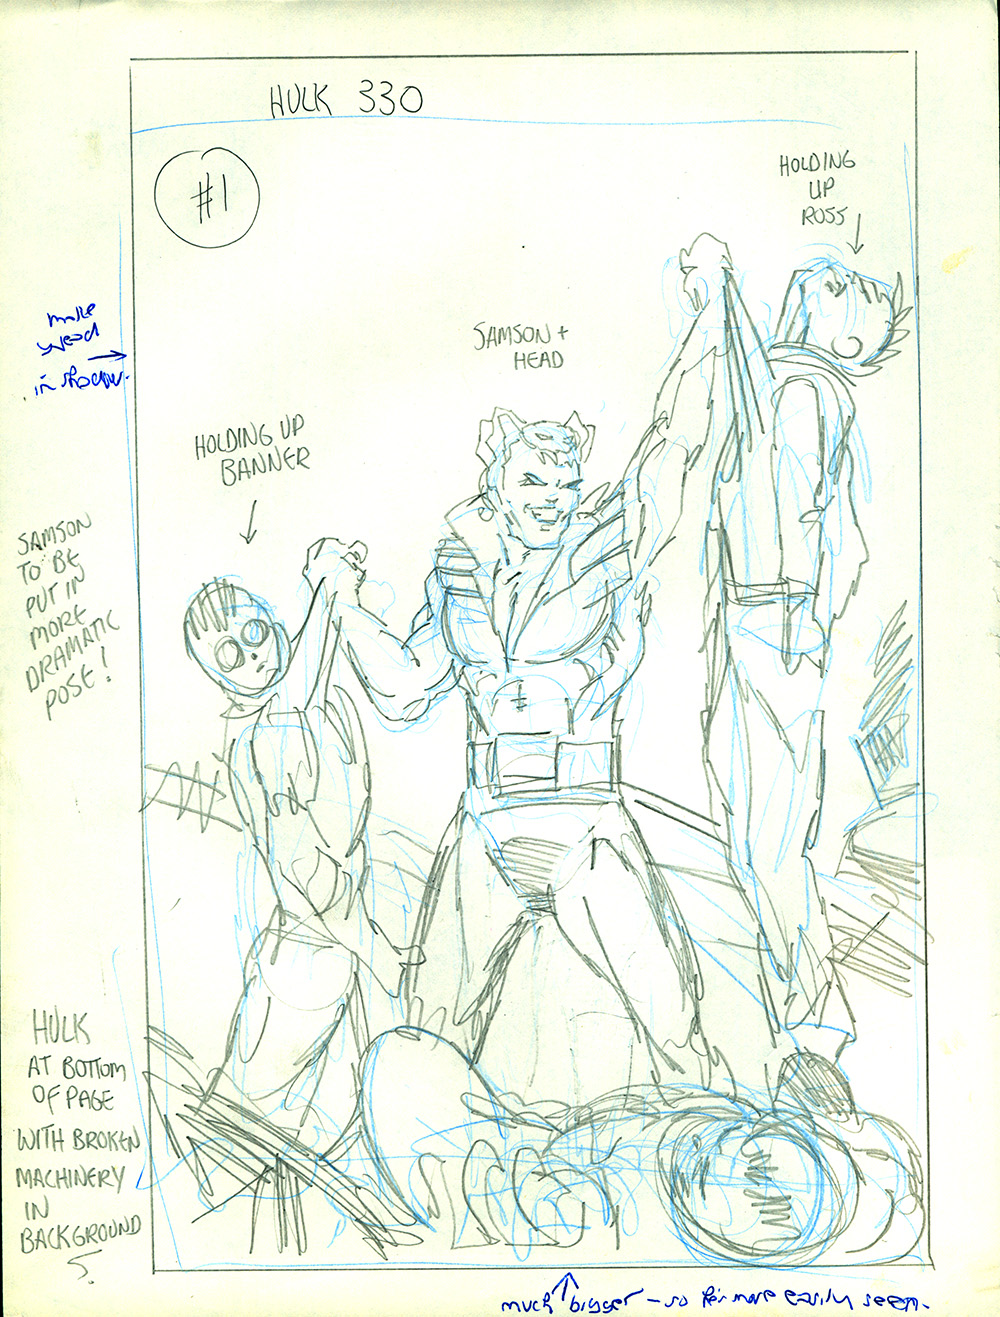 Hulk_330_cover_sketch_1 copy